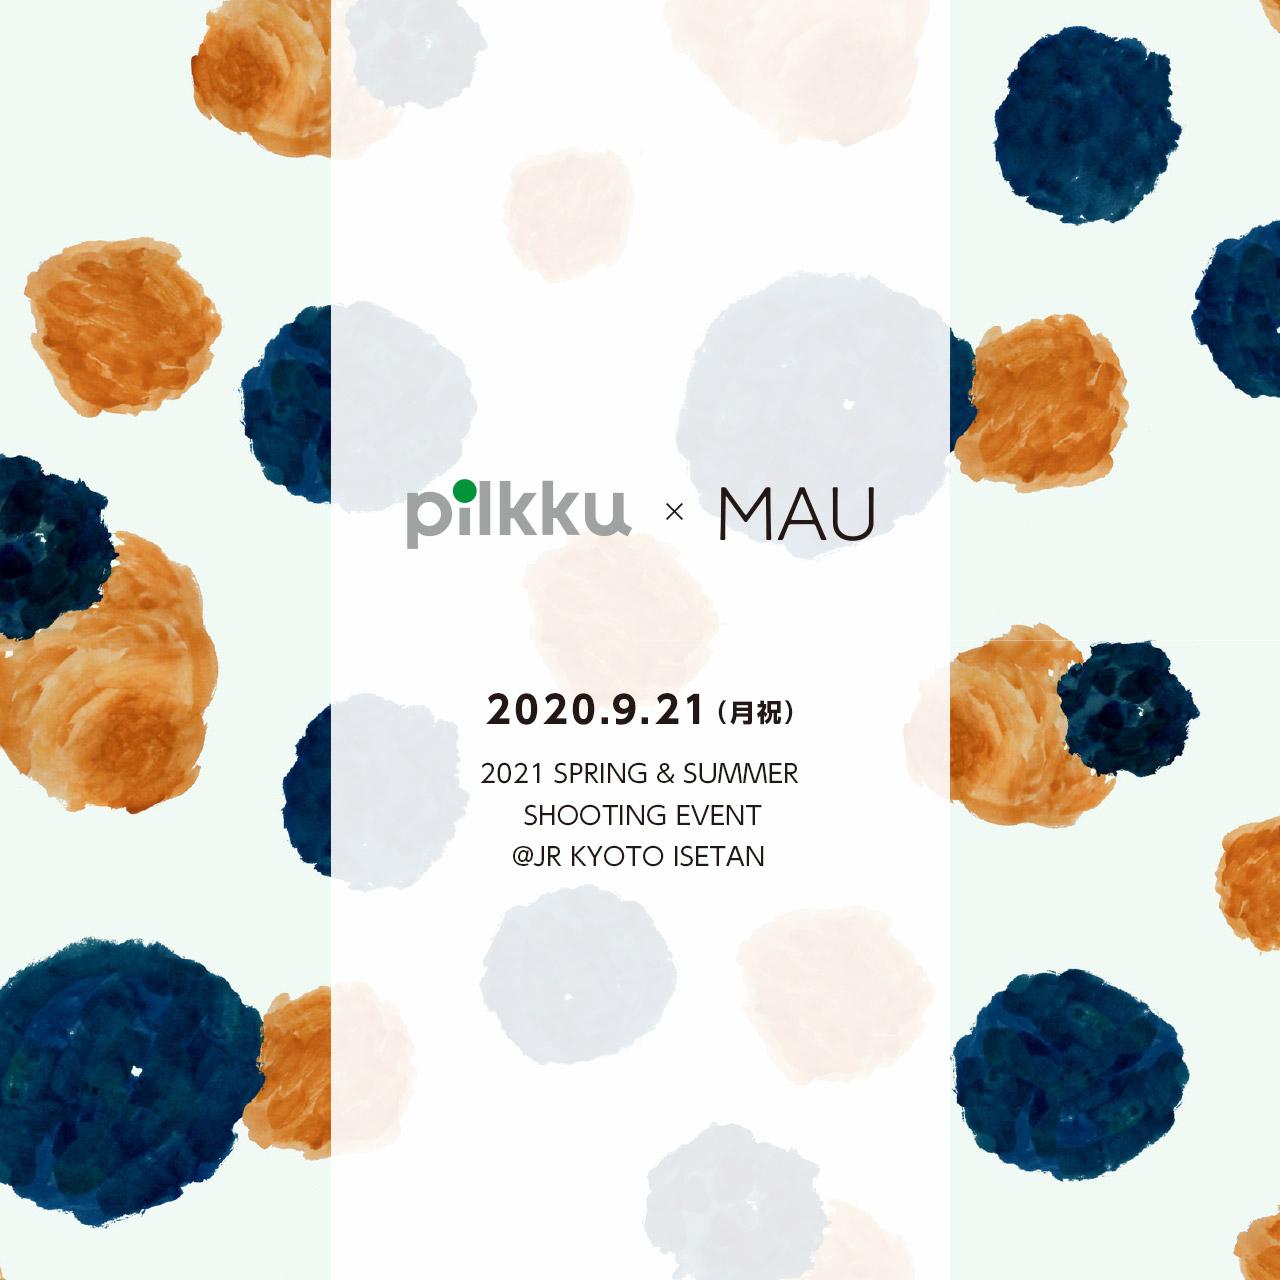 pilkku×MAU 2021 SPRING & SUMMER SHOOTING EVENT @JR KYOTO ISETAN